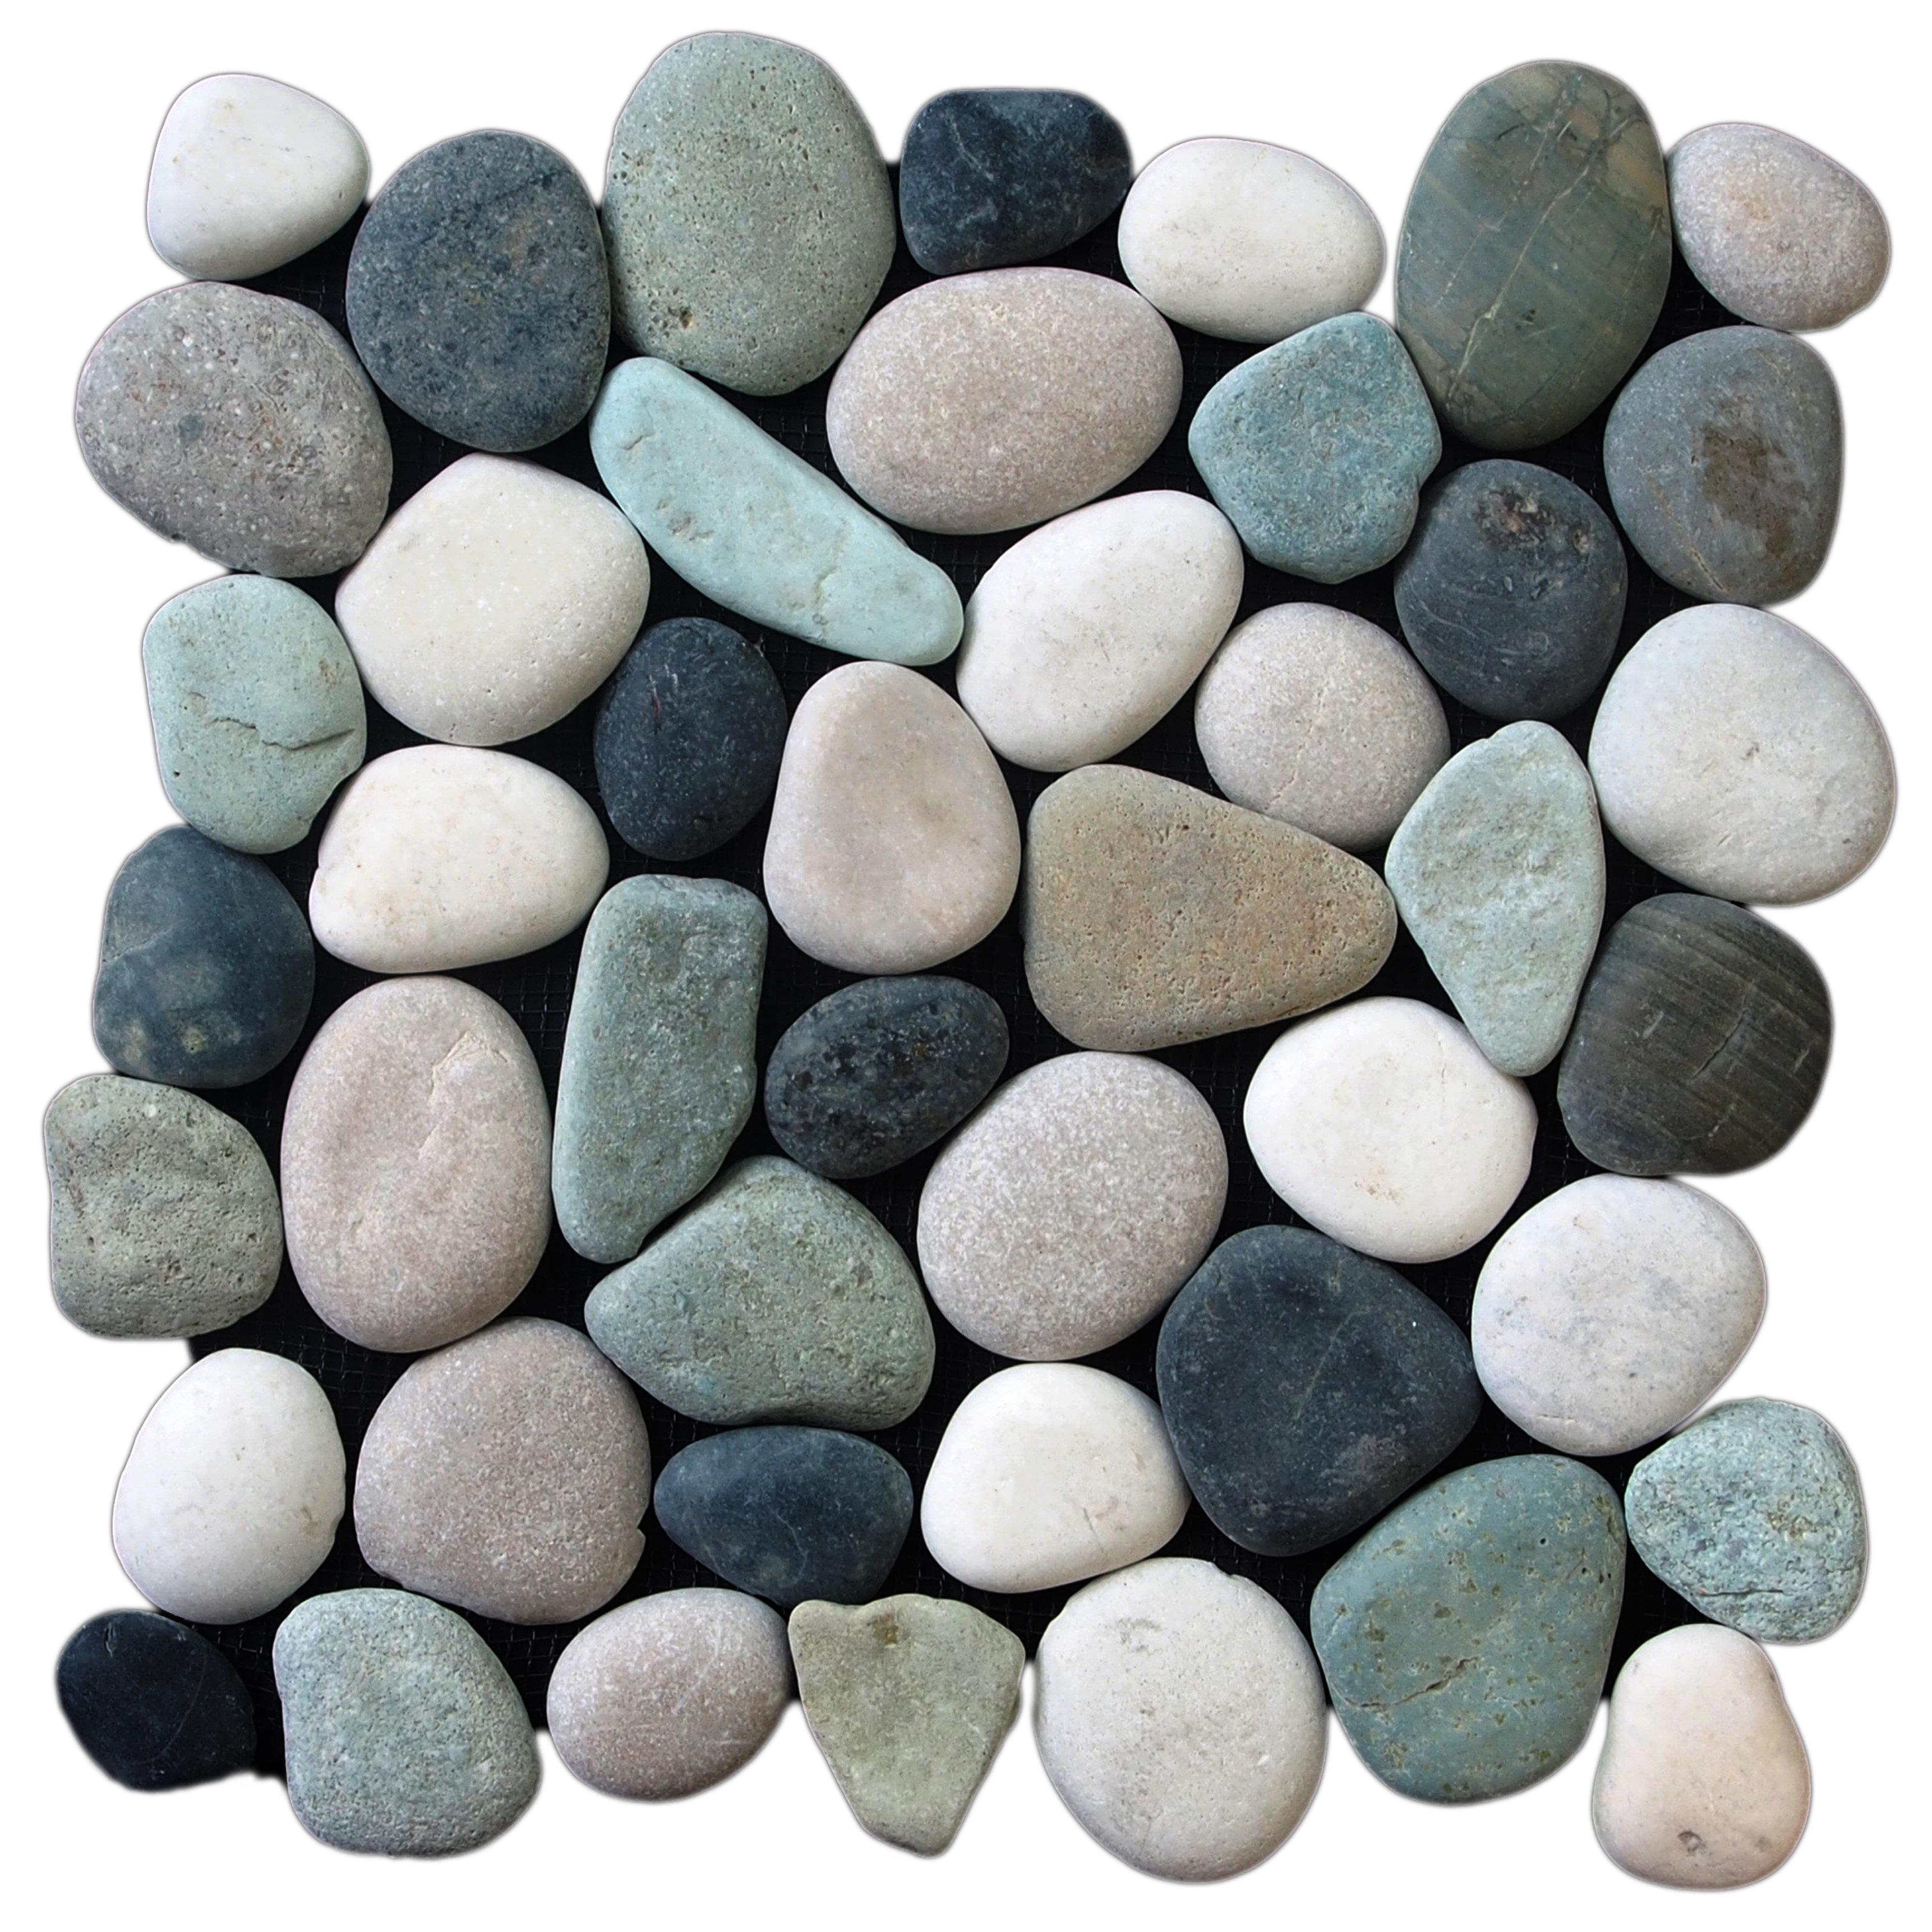 Mixed Color Ceramic Fire River Stones Set Of 24 Charcoal